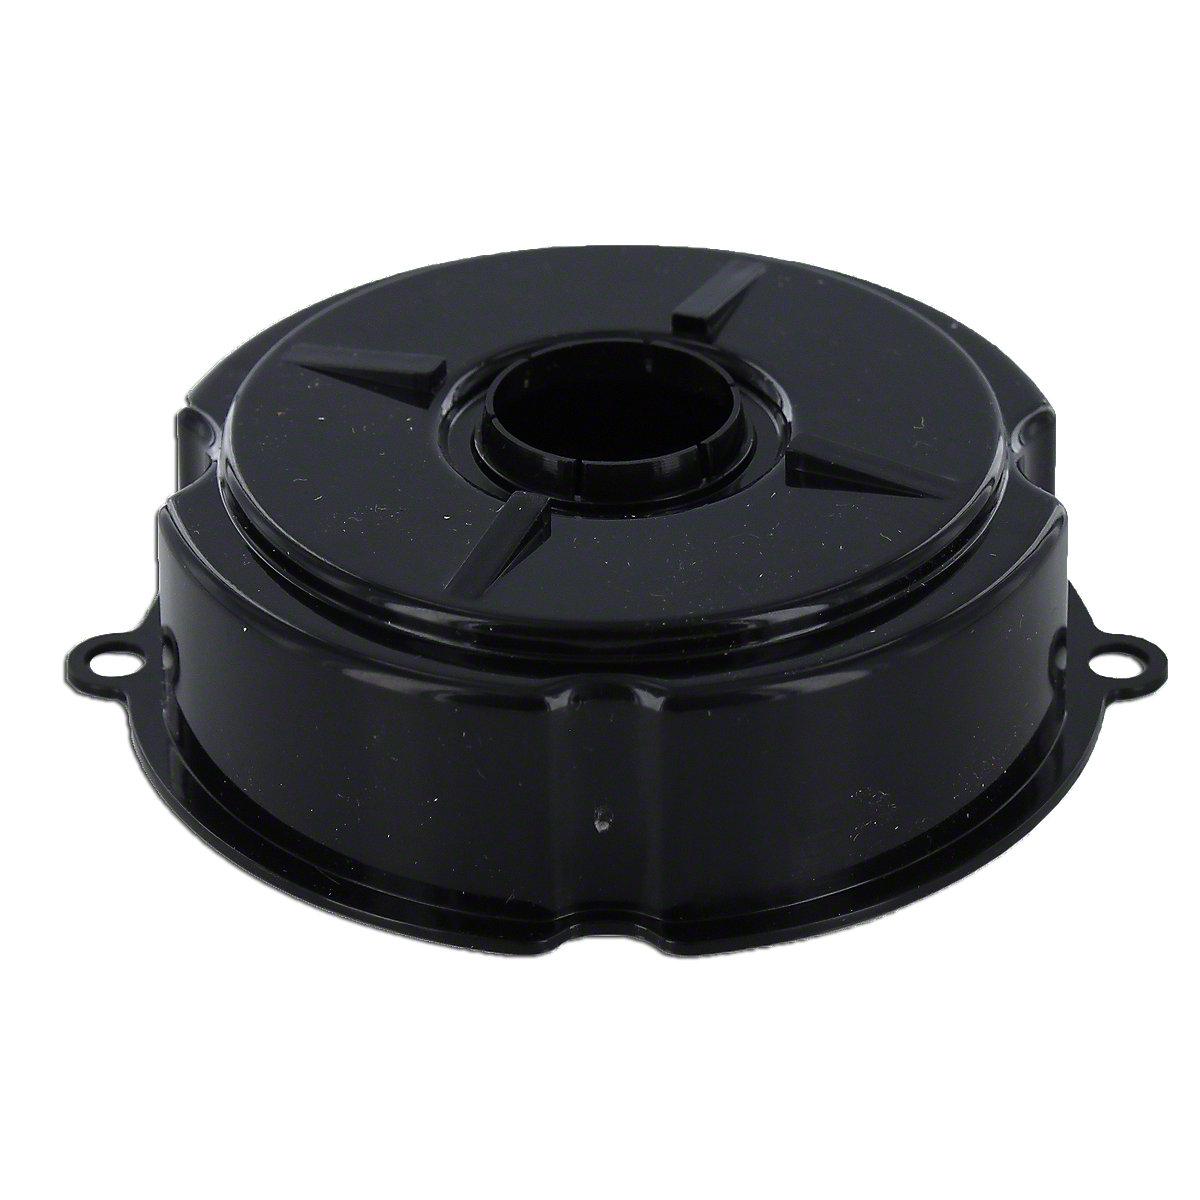 Delco Distributor Dust Cover For Massey Ferguson: 1100, 135, 150, 165, 175, 180, 255, 265.